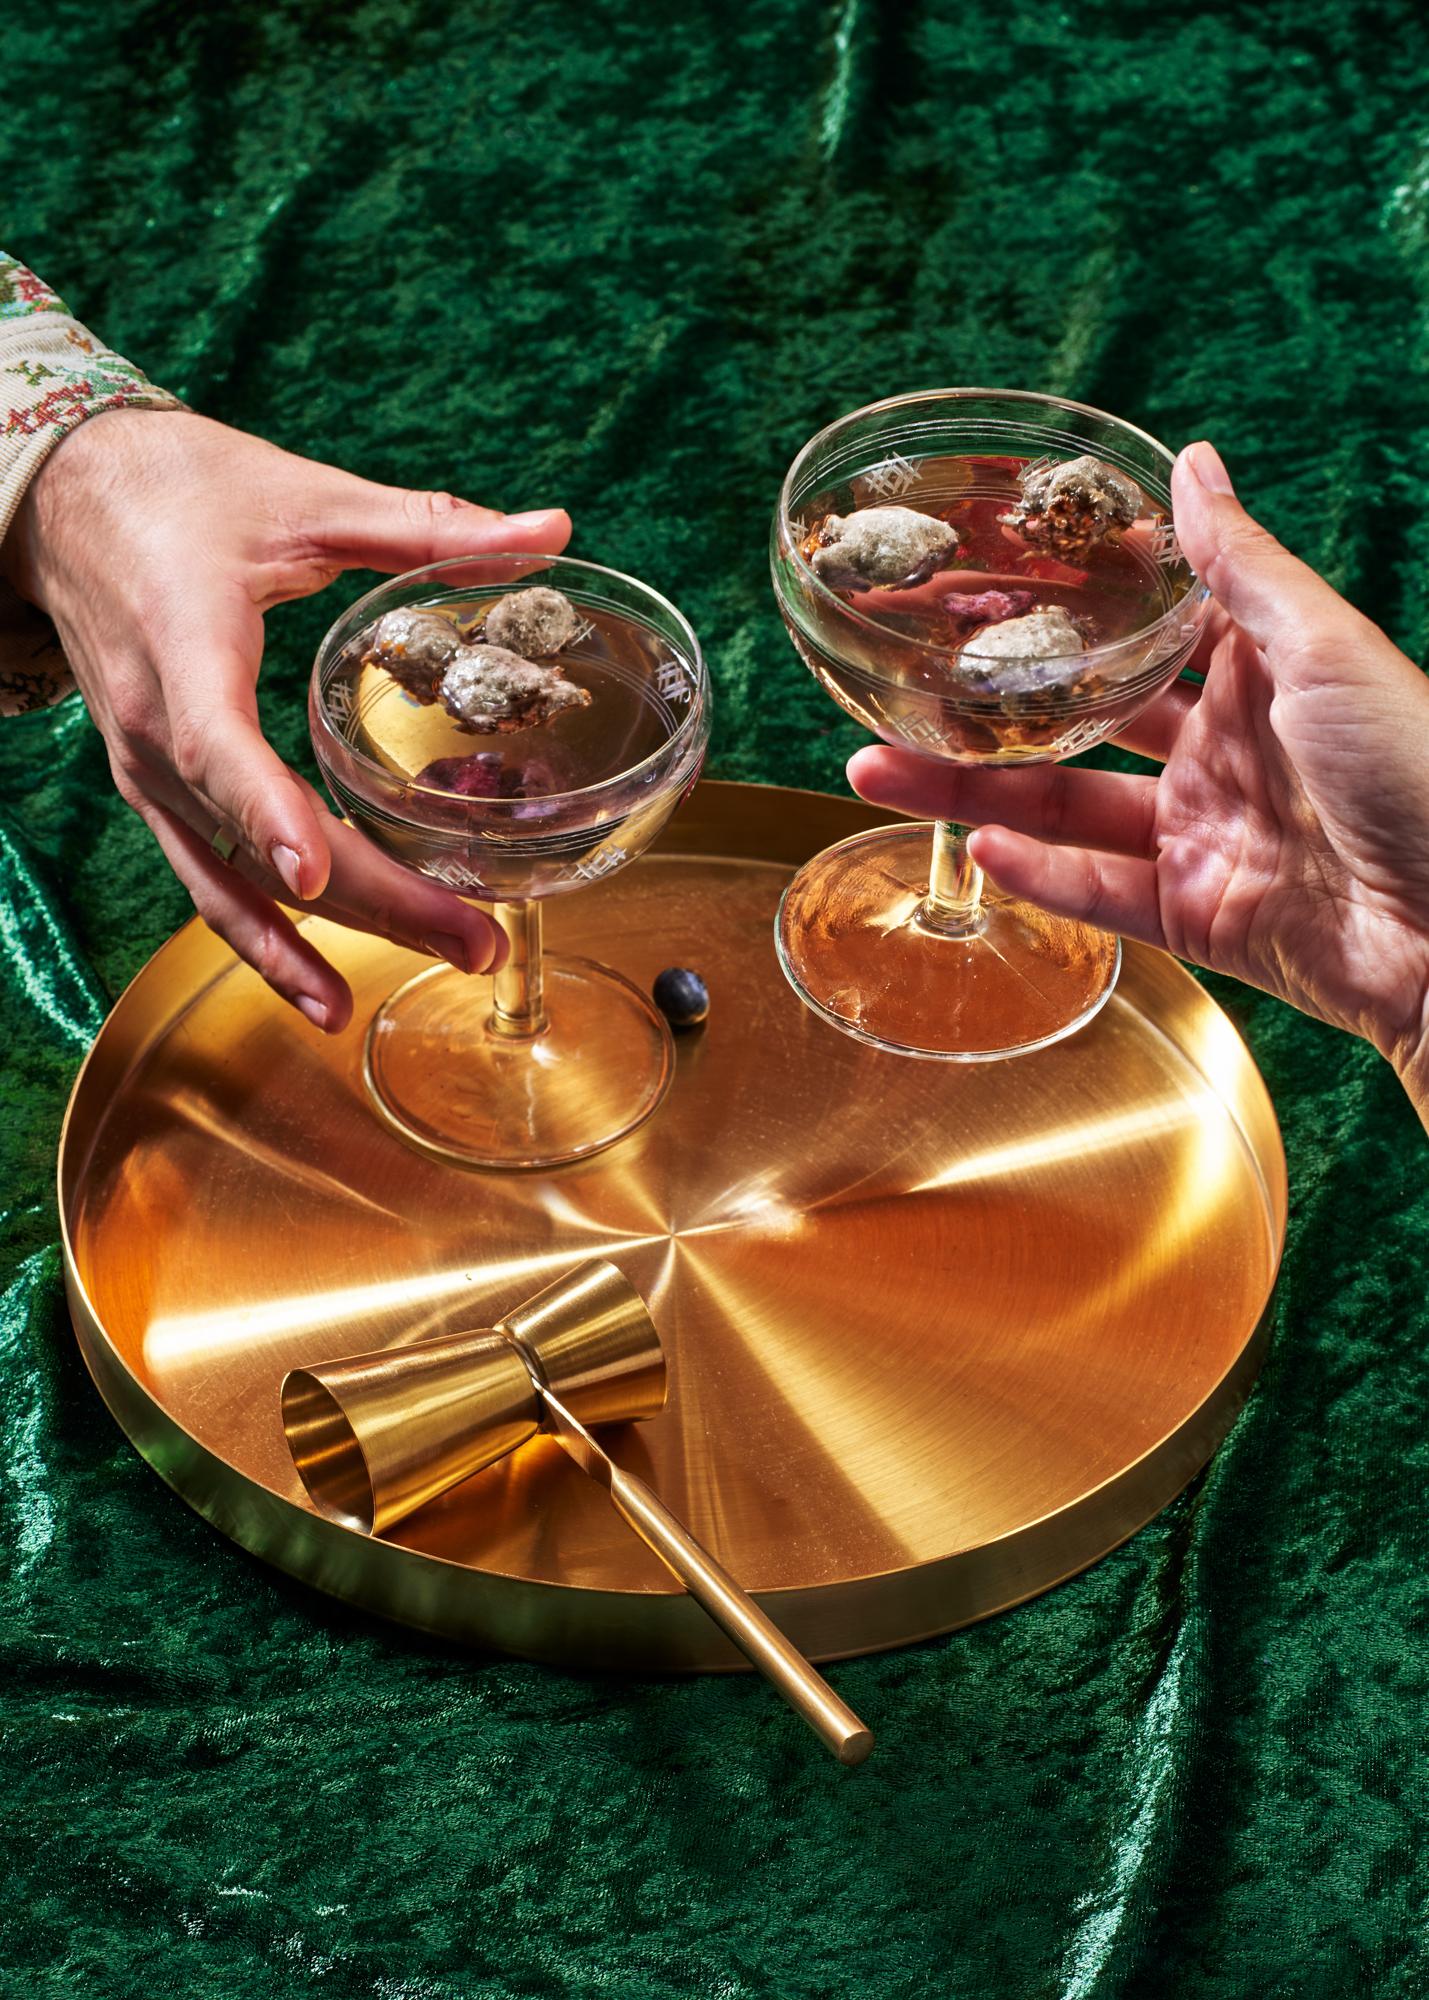 Spoiled-Rotten-Cocktails-Yasara-Gunawardena